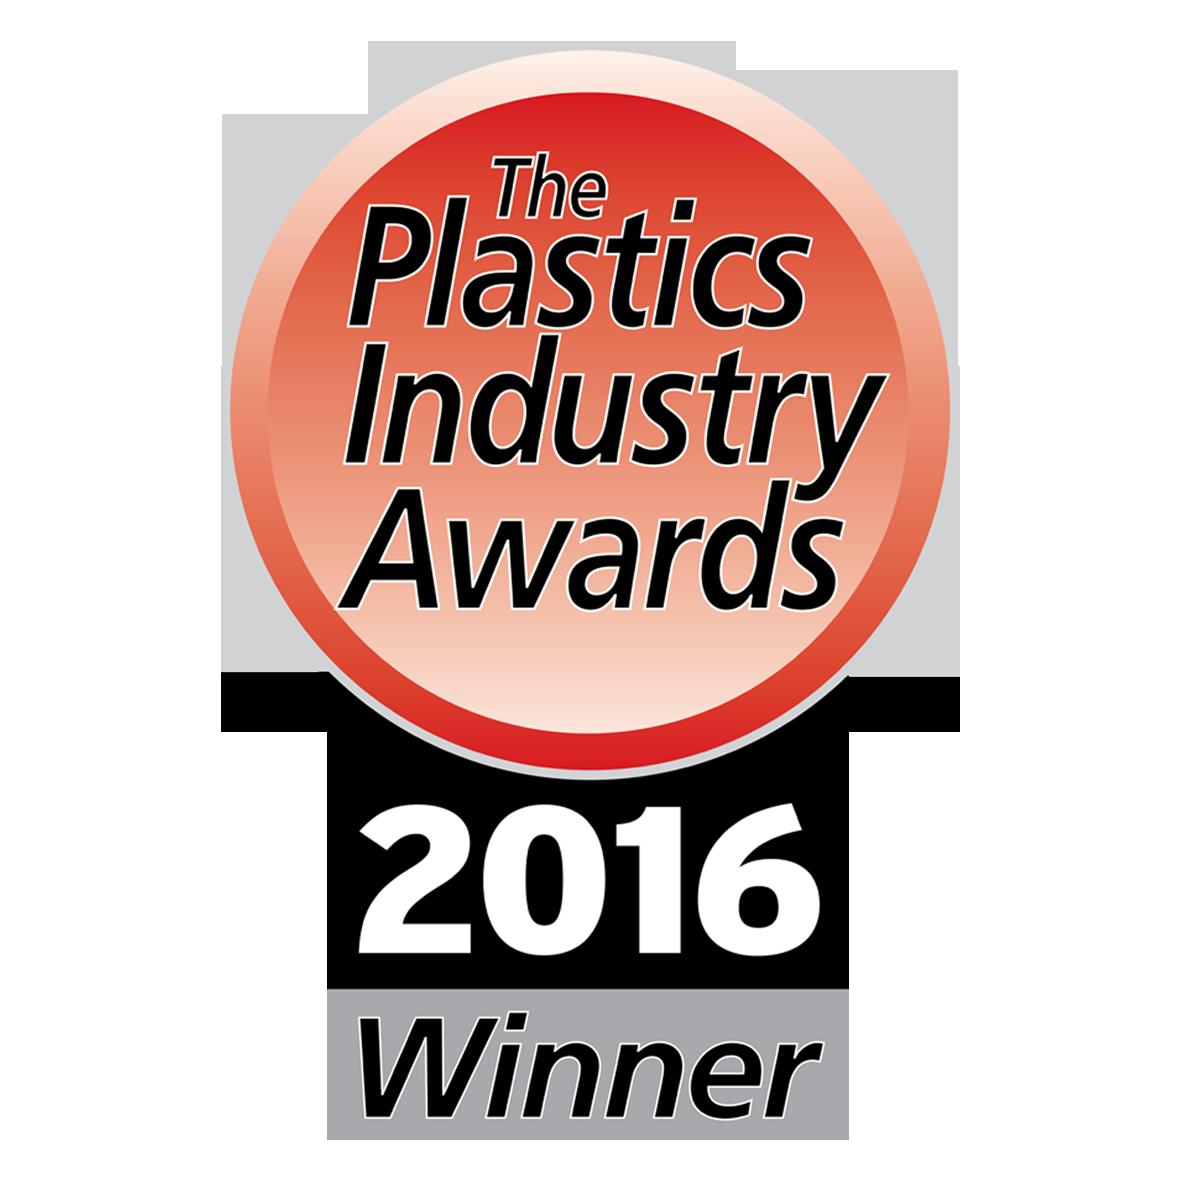 pia-2016-winner-logo_p2